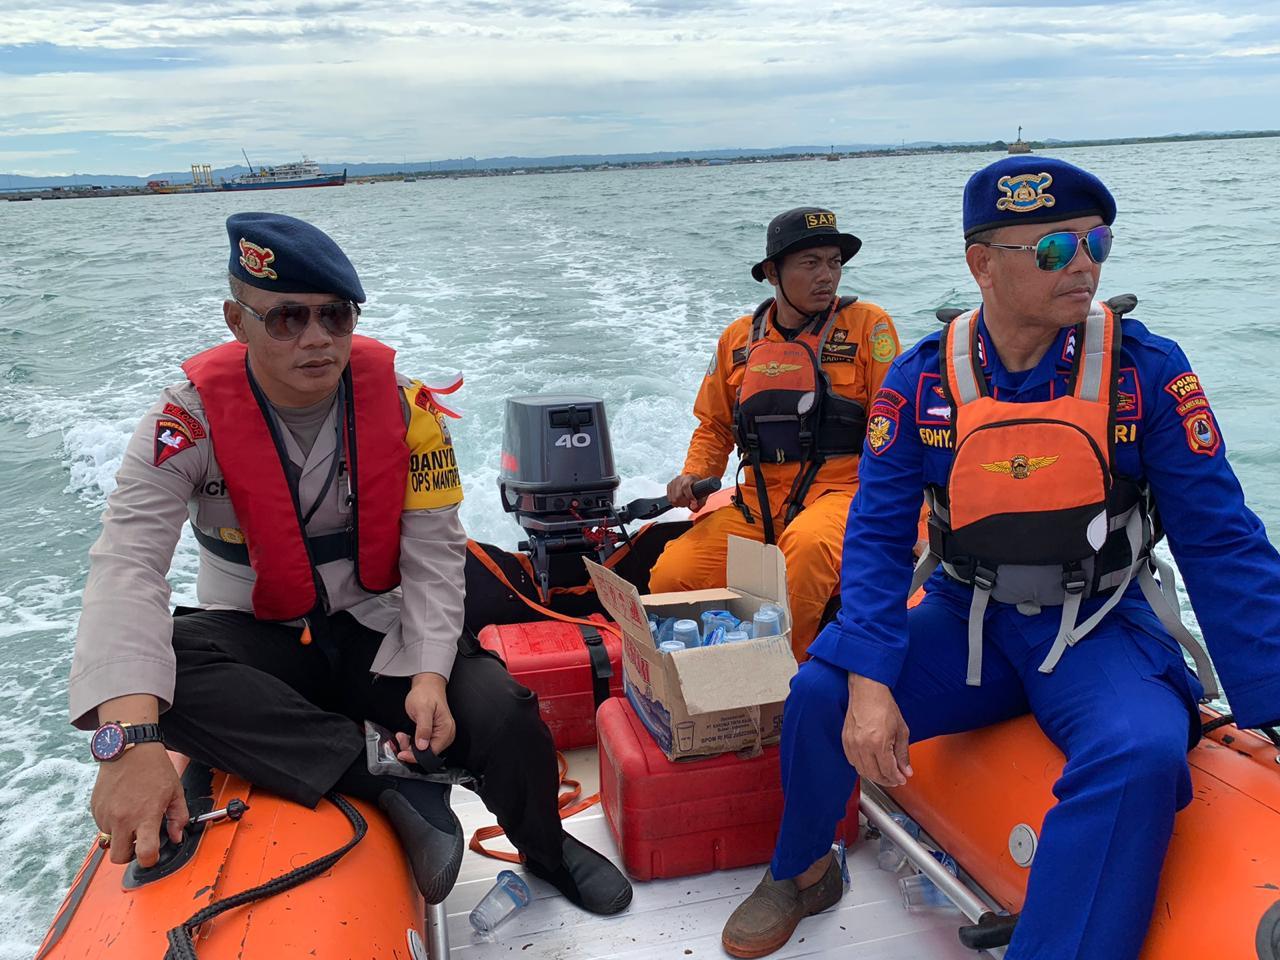 Danyon C Pelopor Sat Brimob Polda Sulsel Pimpin Pencarian Penumpang KMP Mishima yang Lompat di Laut